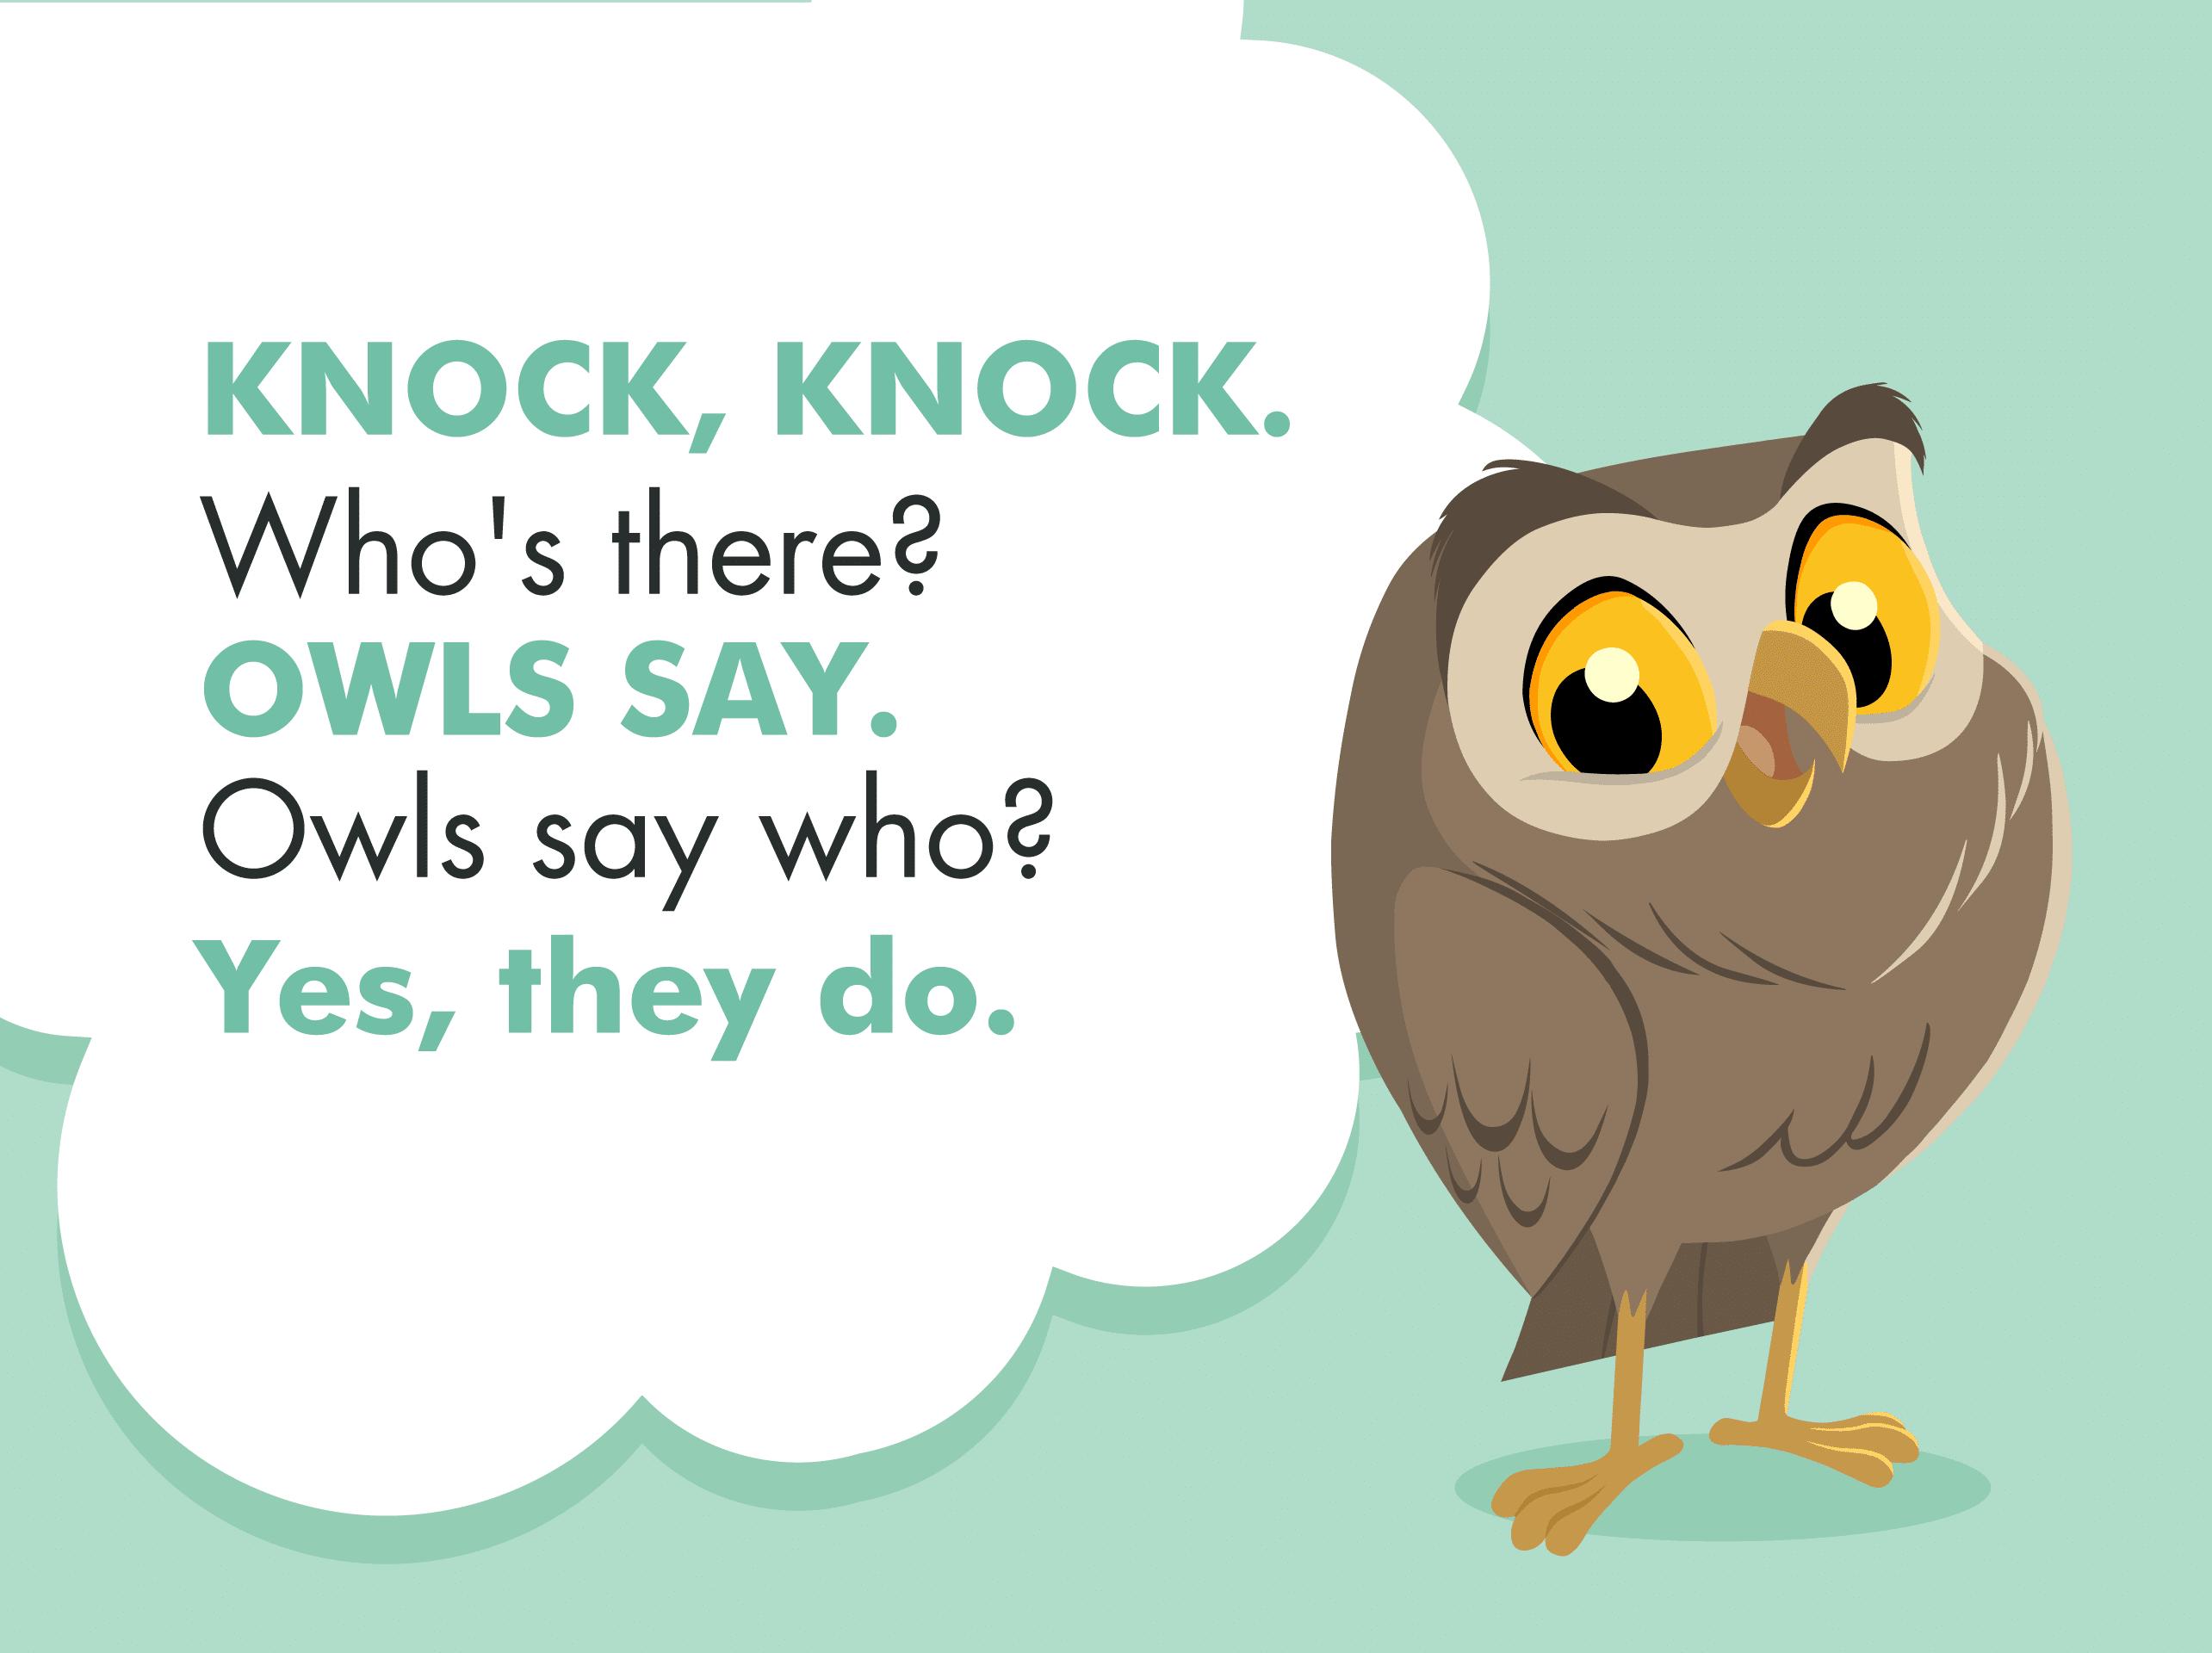 A graphic illustrating an owl knock knock joke for kids.